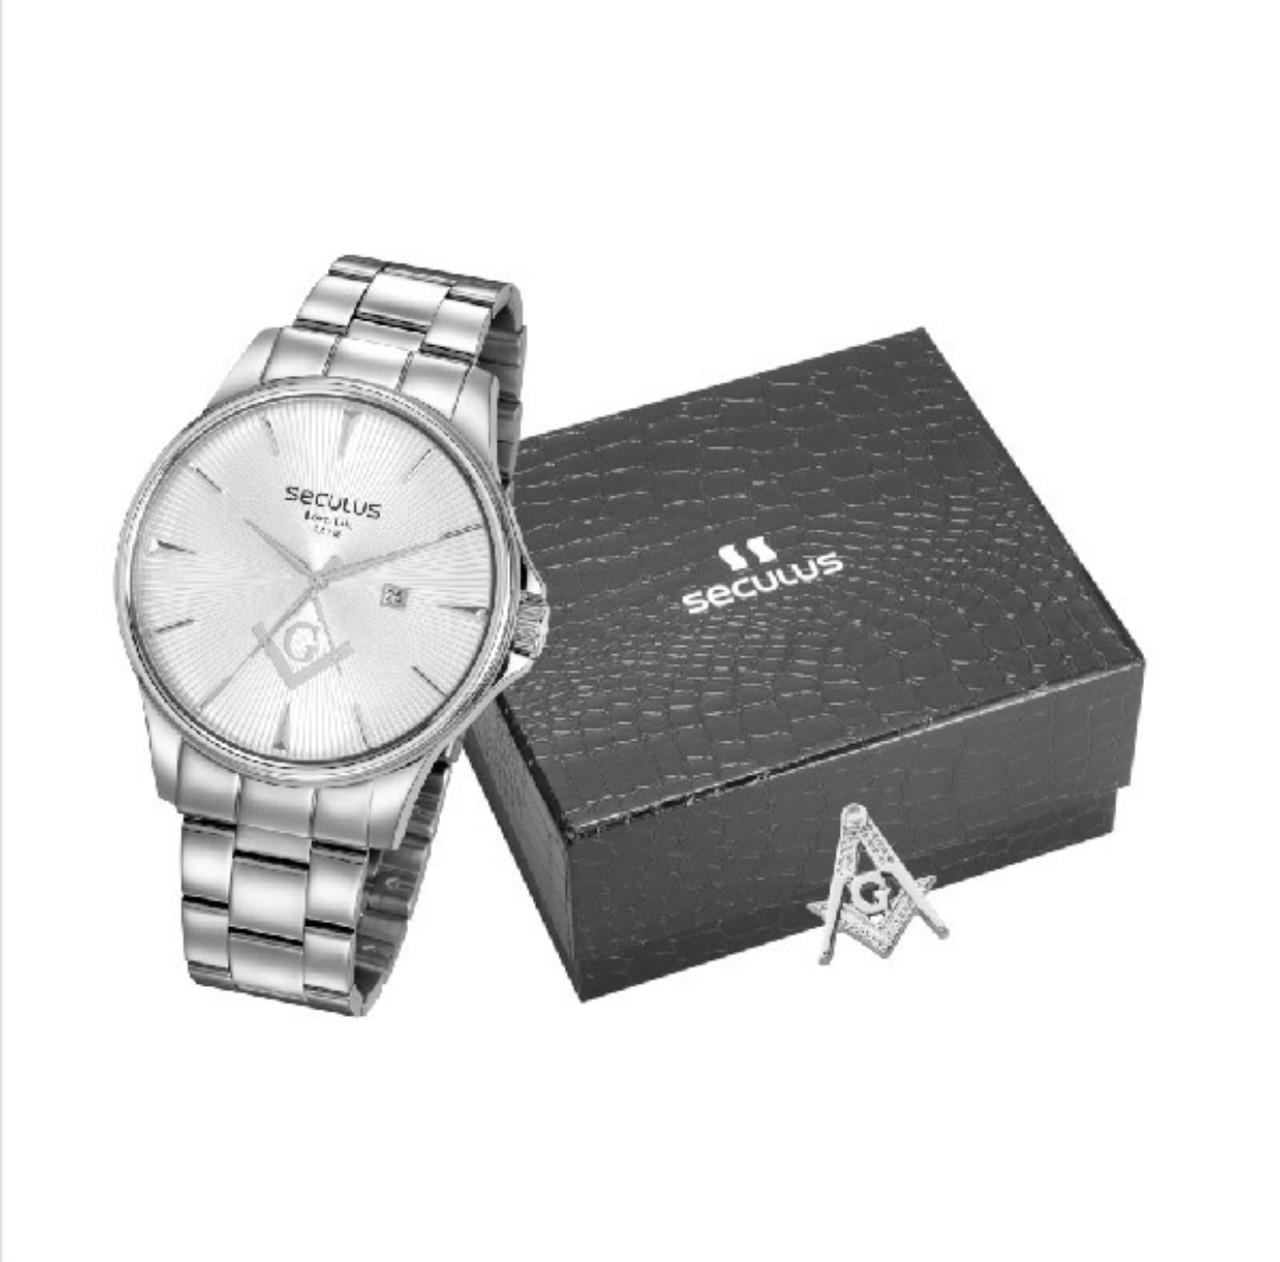 Relógio Seculus Masculino Maçonaria cor Prata